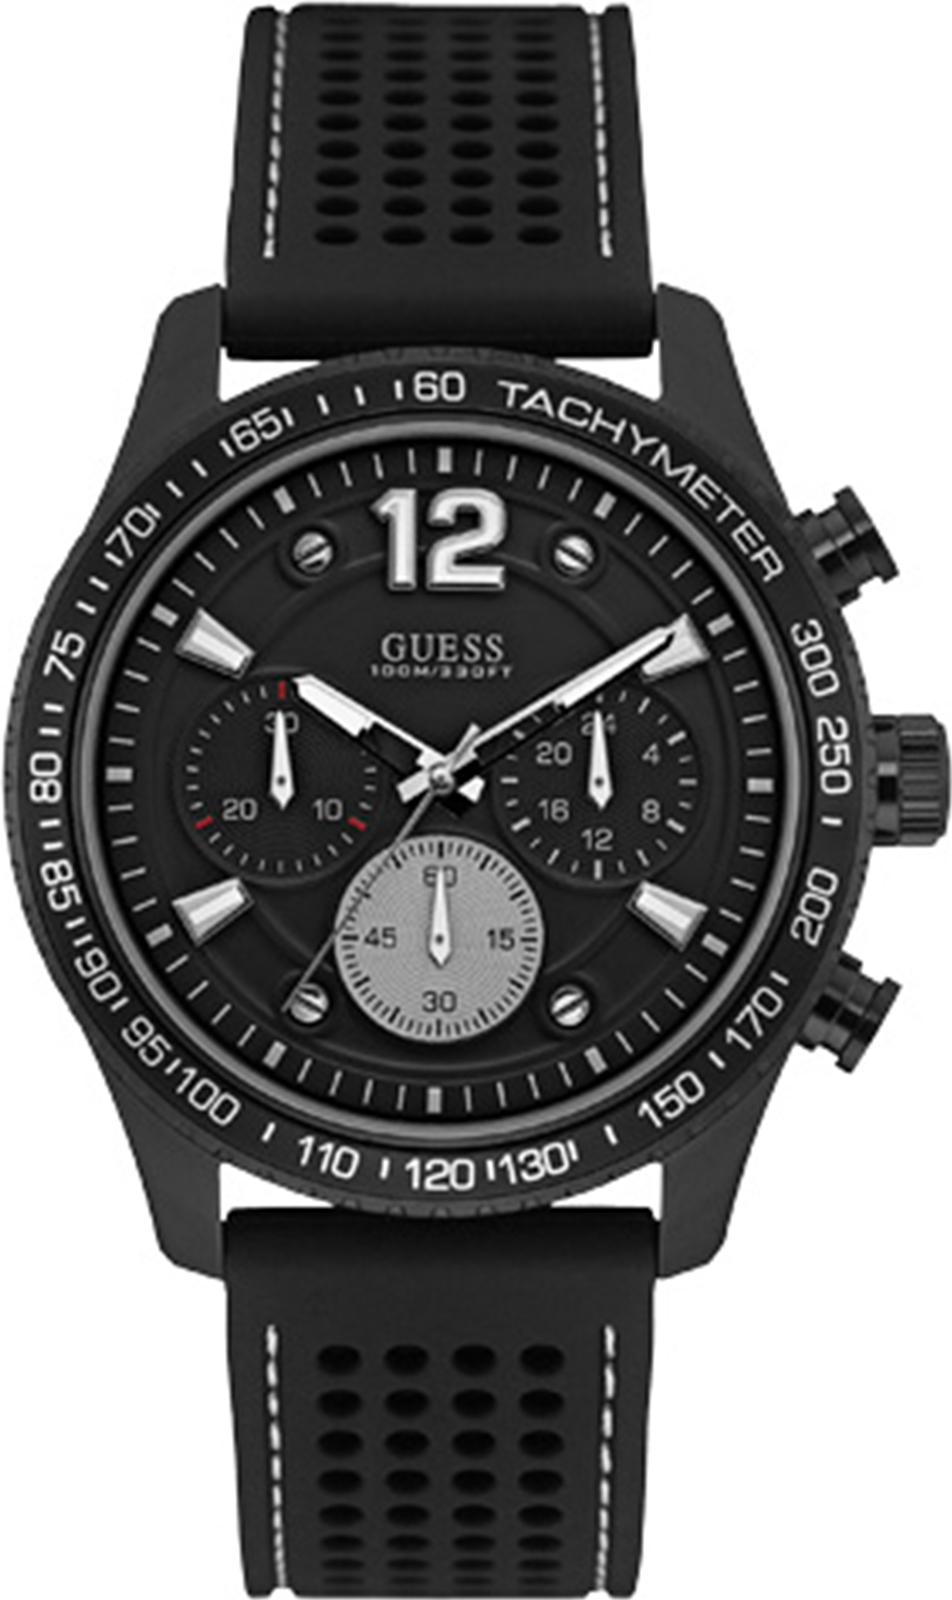 лучшая цена Часы Guess FLEET